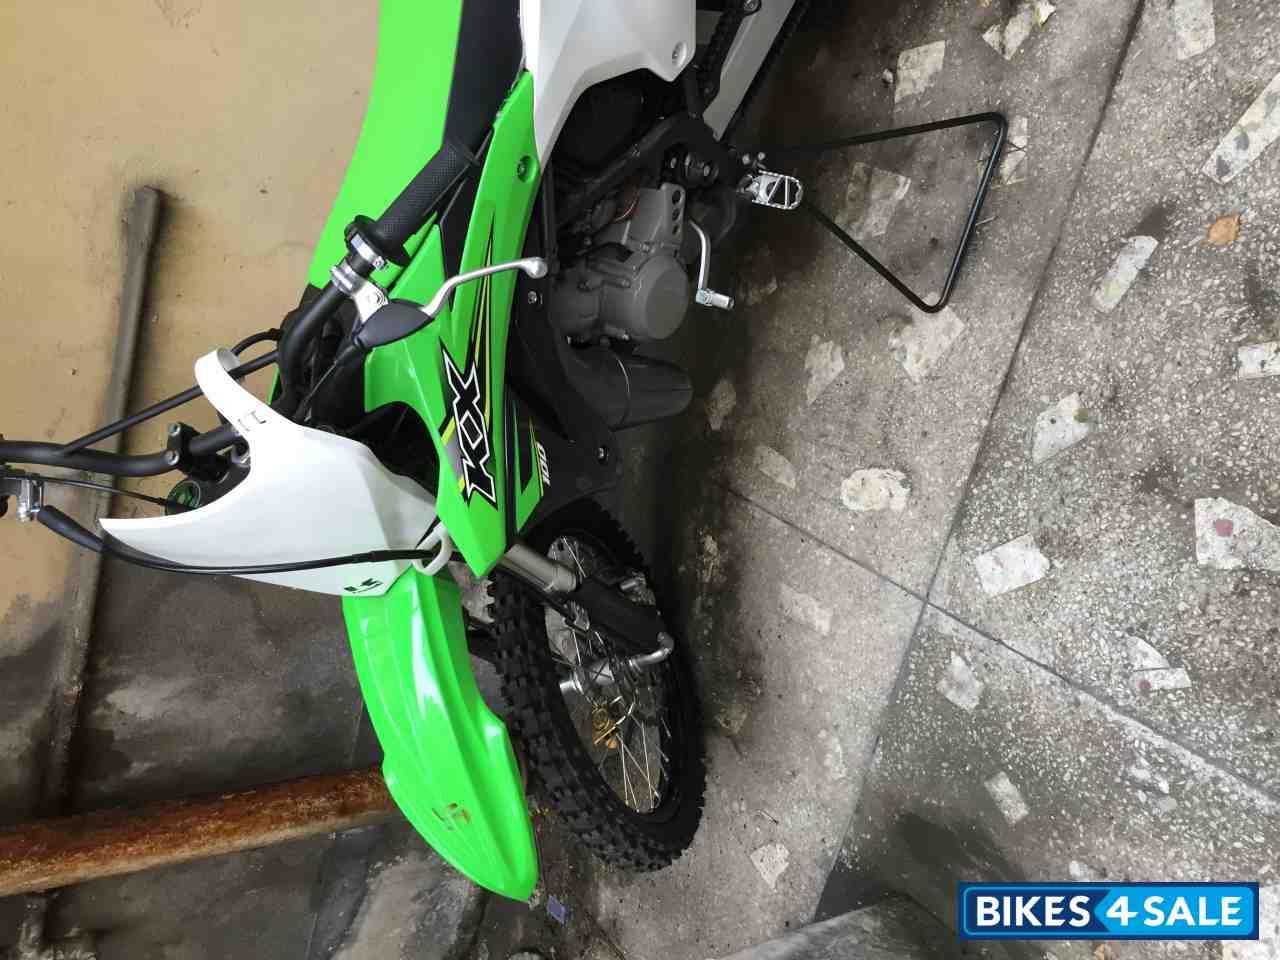 Used 2019 model Kawasaki KLX 110 for sale in Mumbai  ID